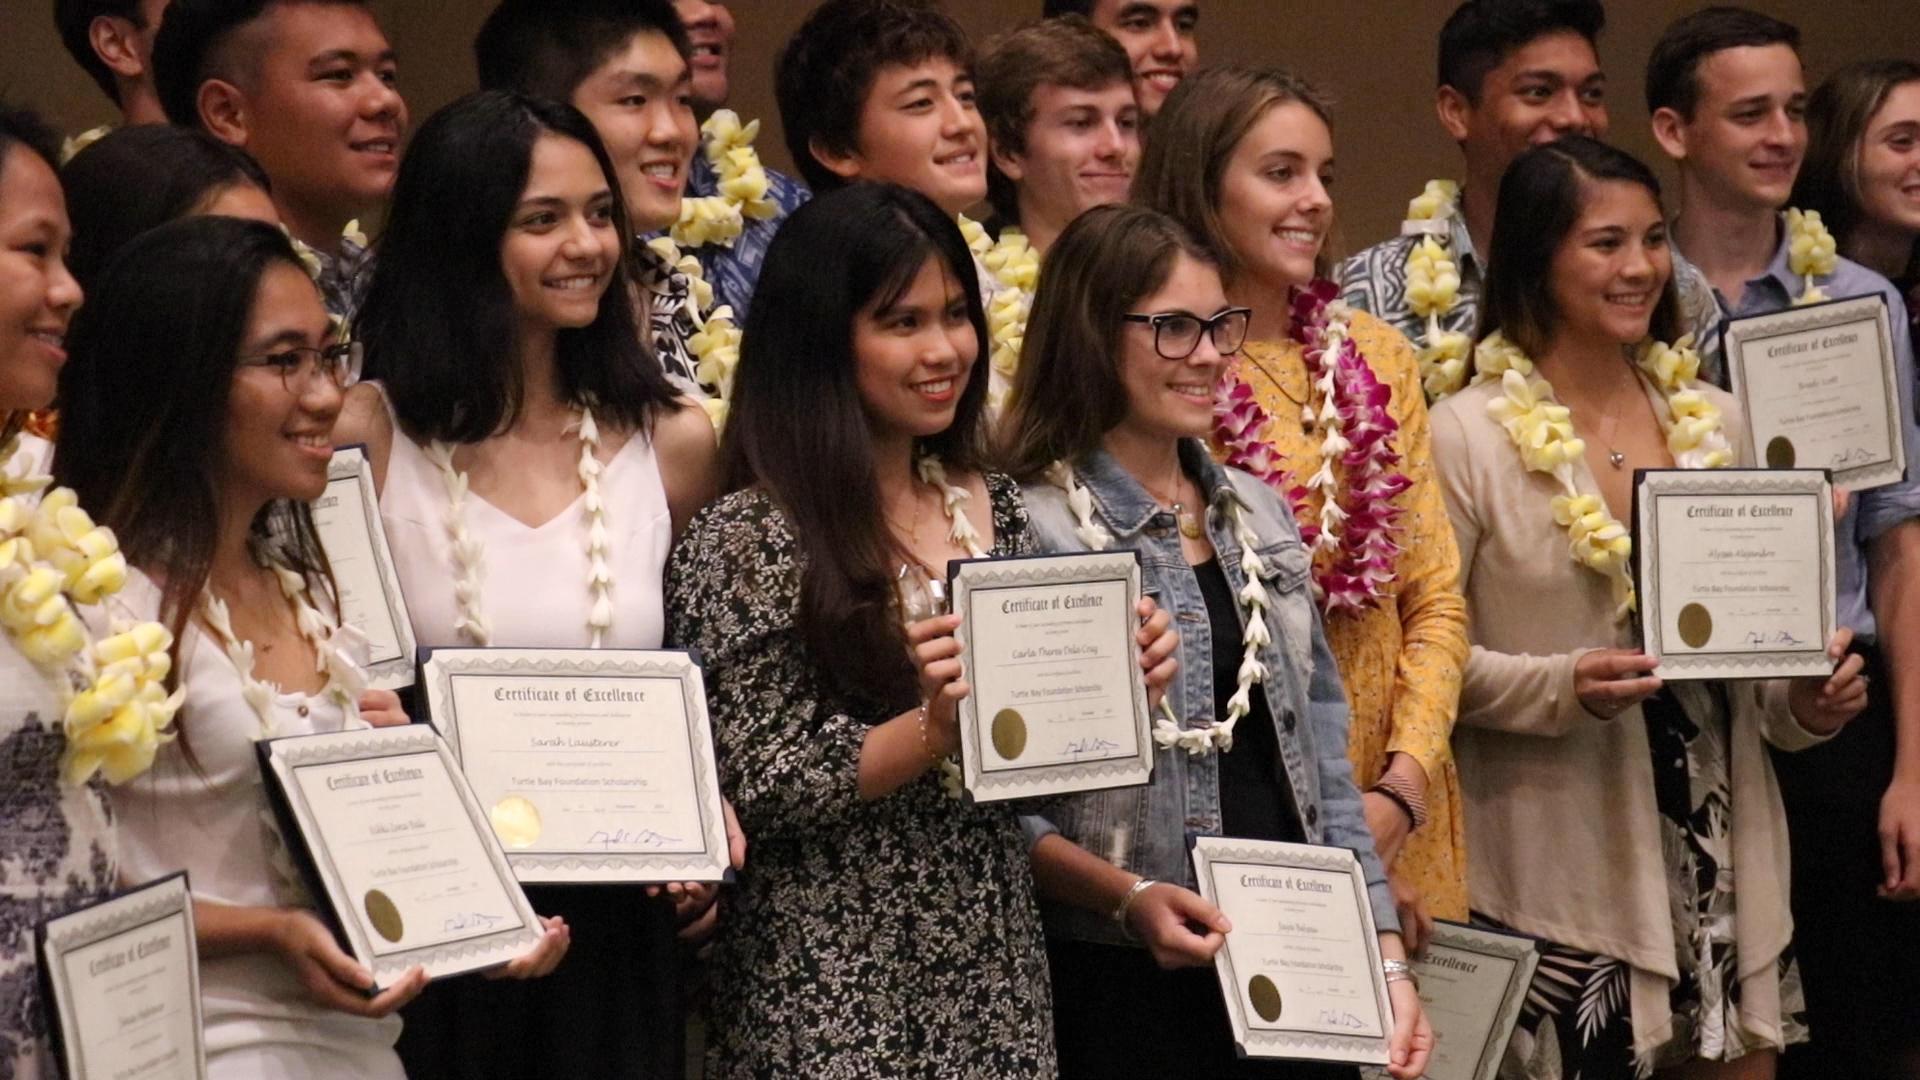 Turtle Bay Foundation Awards Ceremony still 4